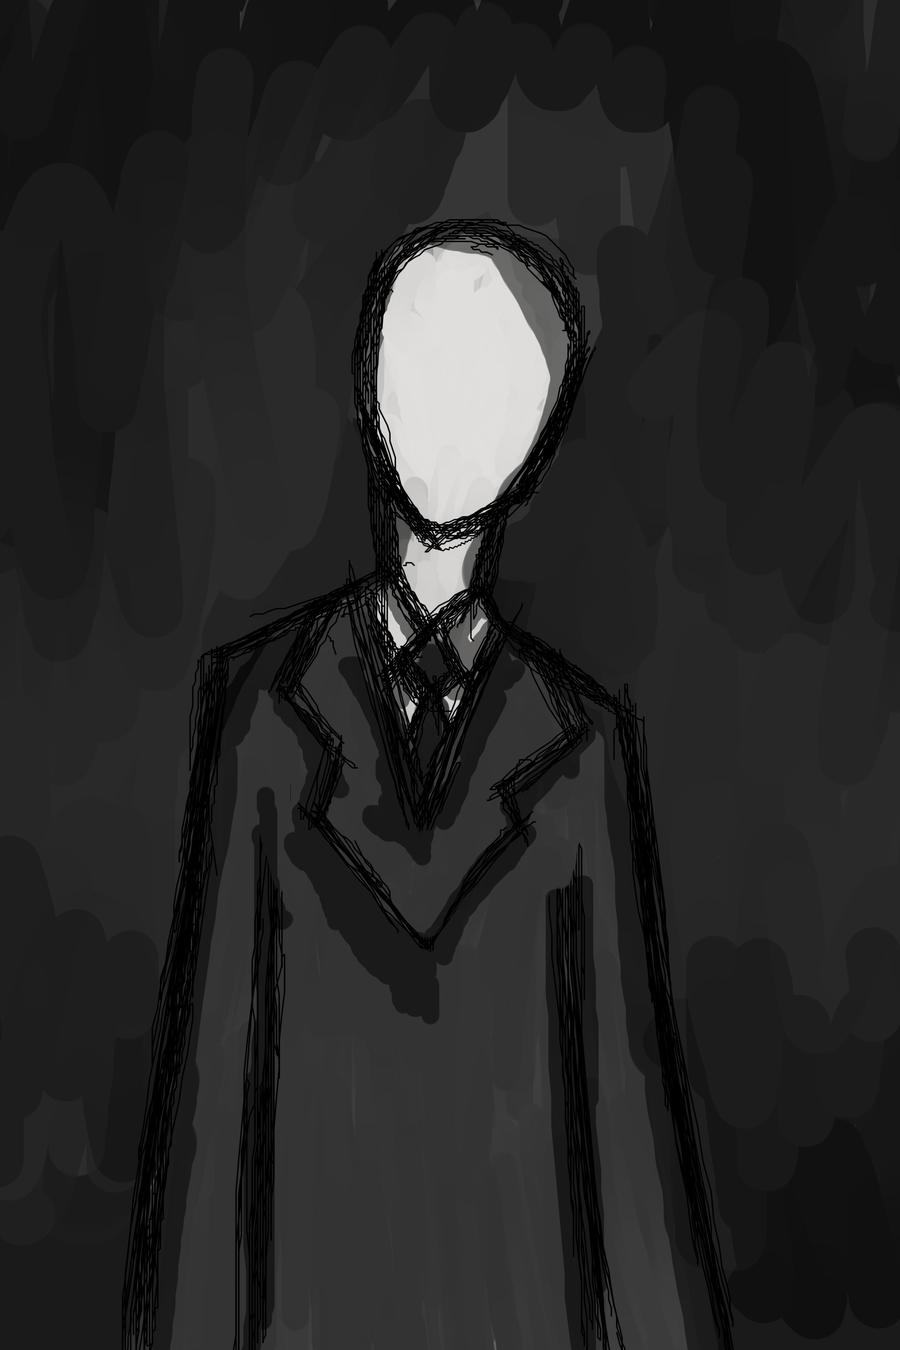 slender by Dr-pepper14